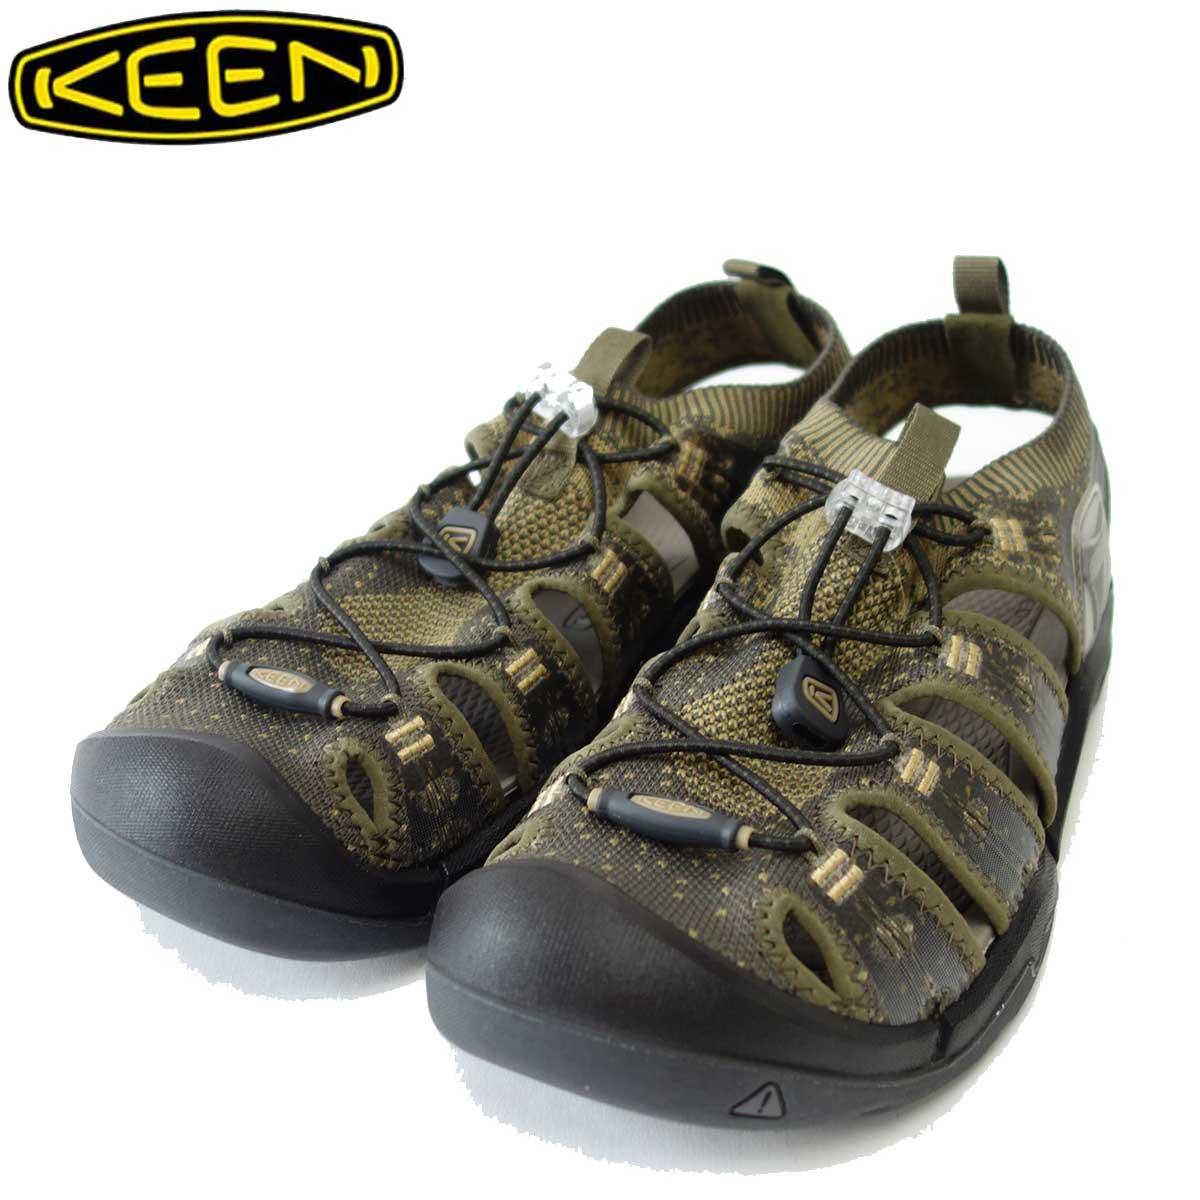 KEEN キーン EVOFIT 1 (エヴォフィット ワン) 1021388(メンズ)カラー:Dark Olive / Antique Bronze 「靴」